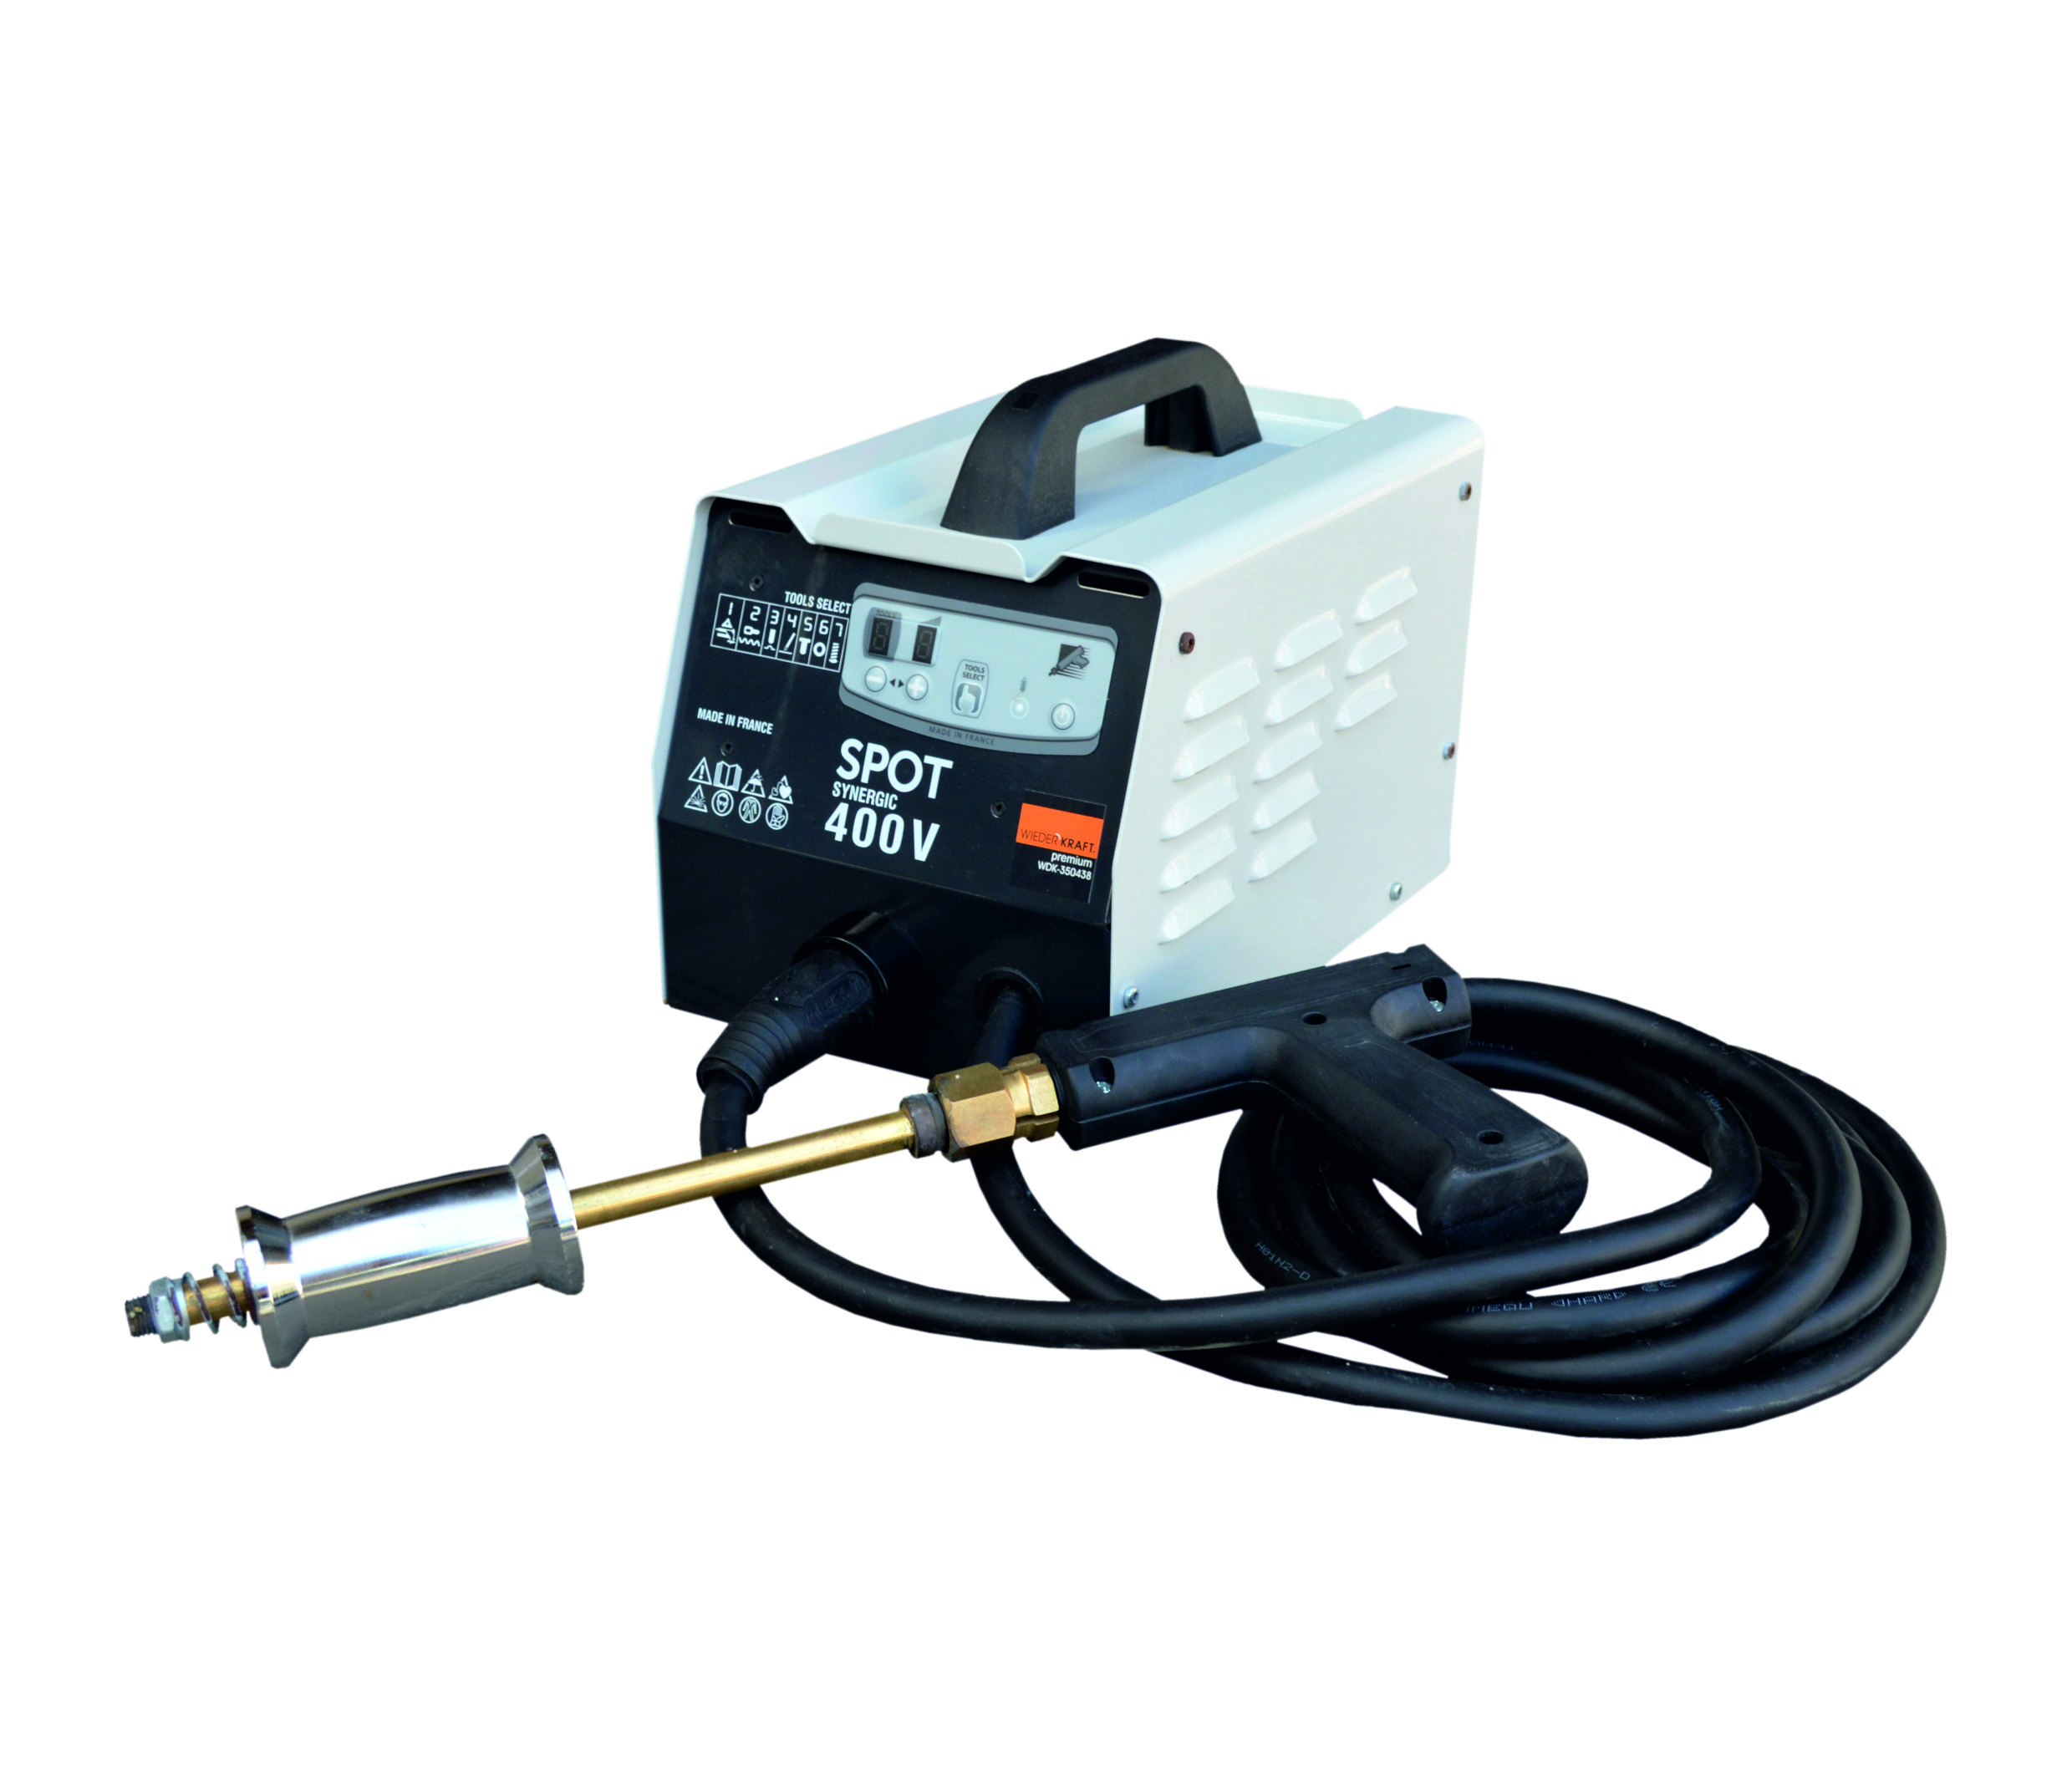 Сварочный аппарат Wiederkraft Wdk-350438